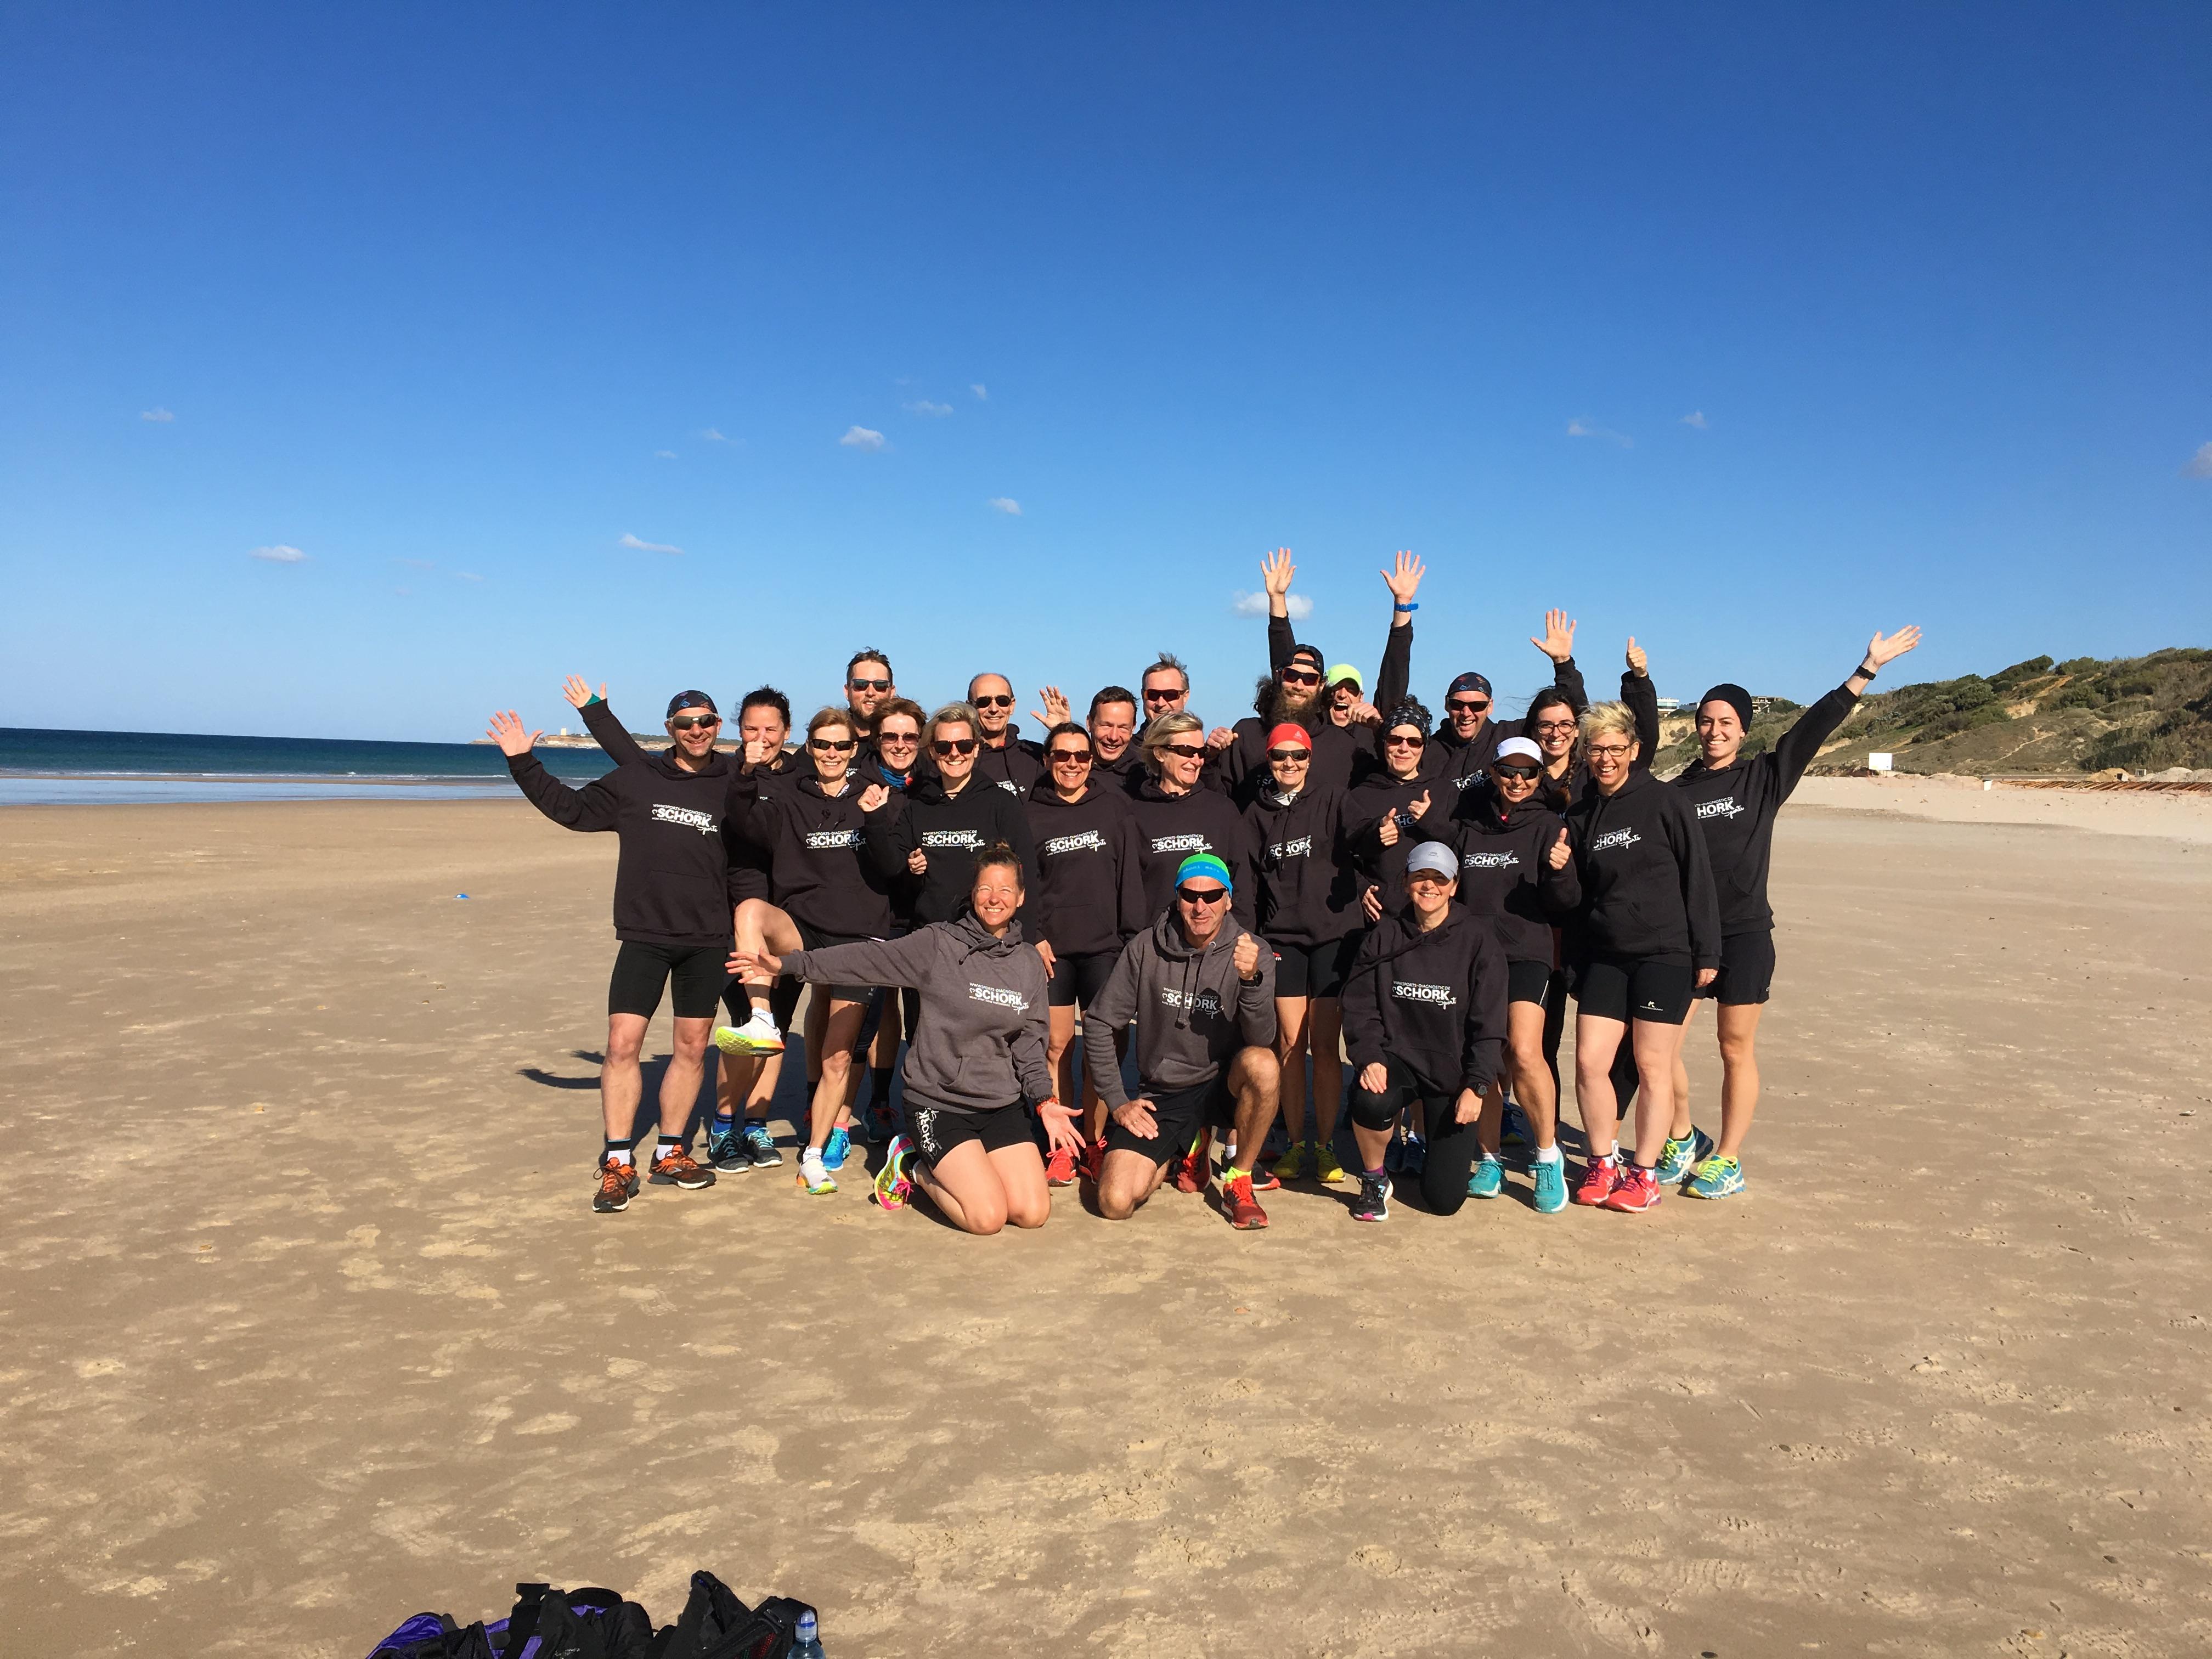 Andalusien 2020 - SCHORK Sports, Freinsheim